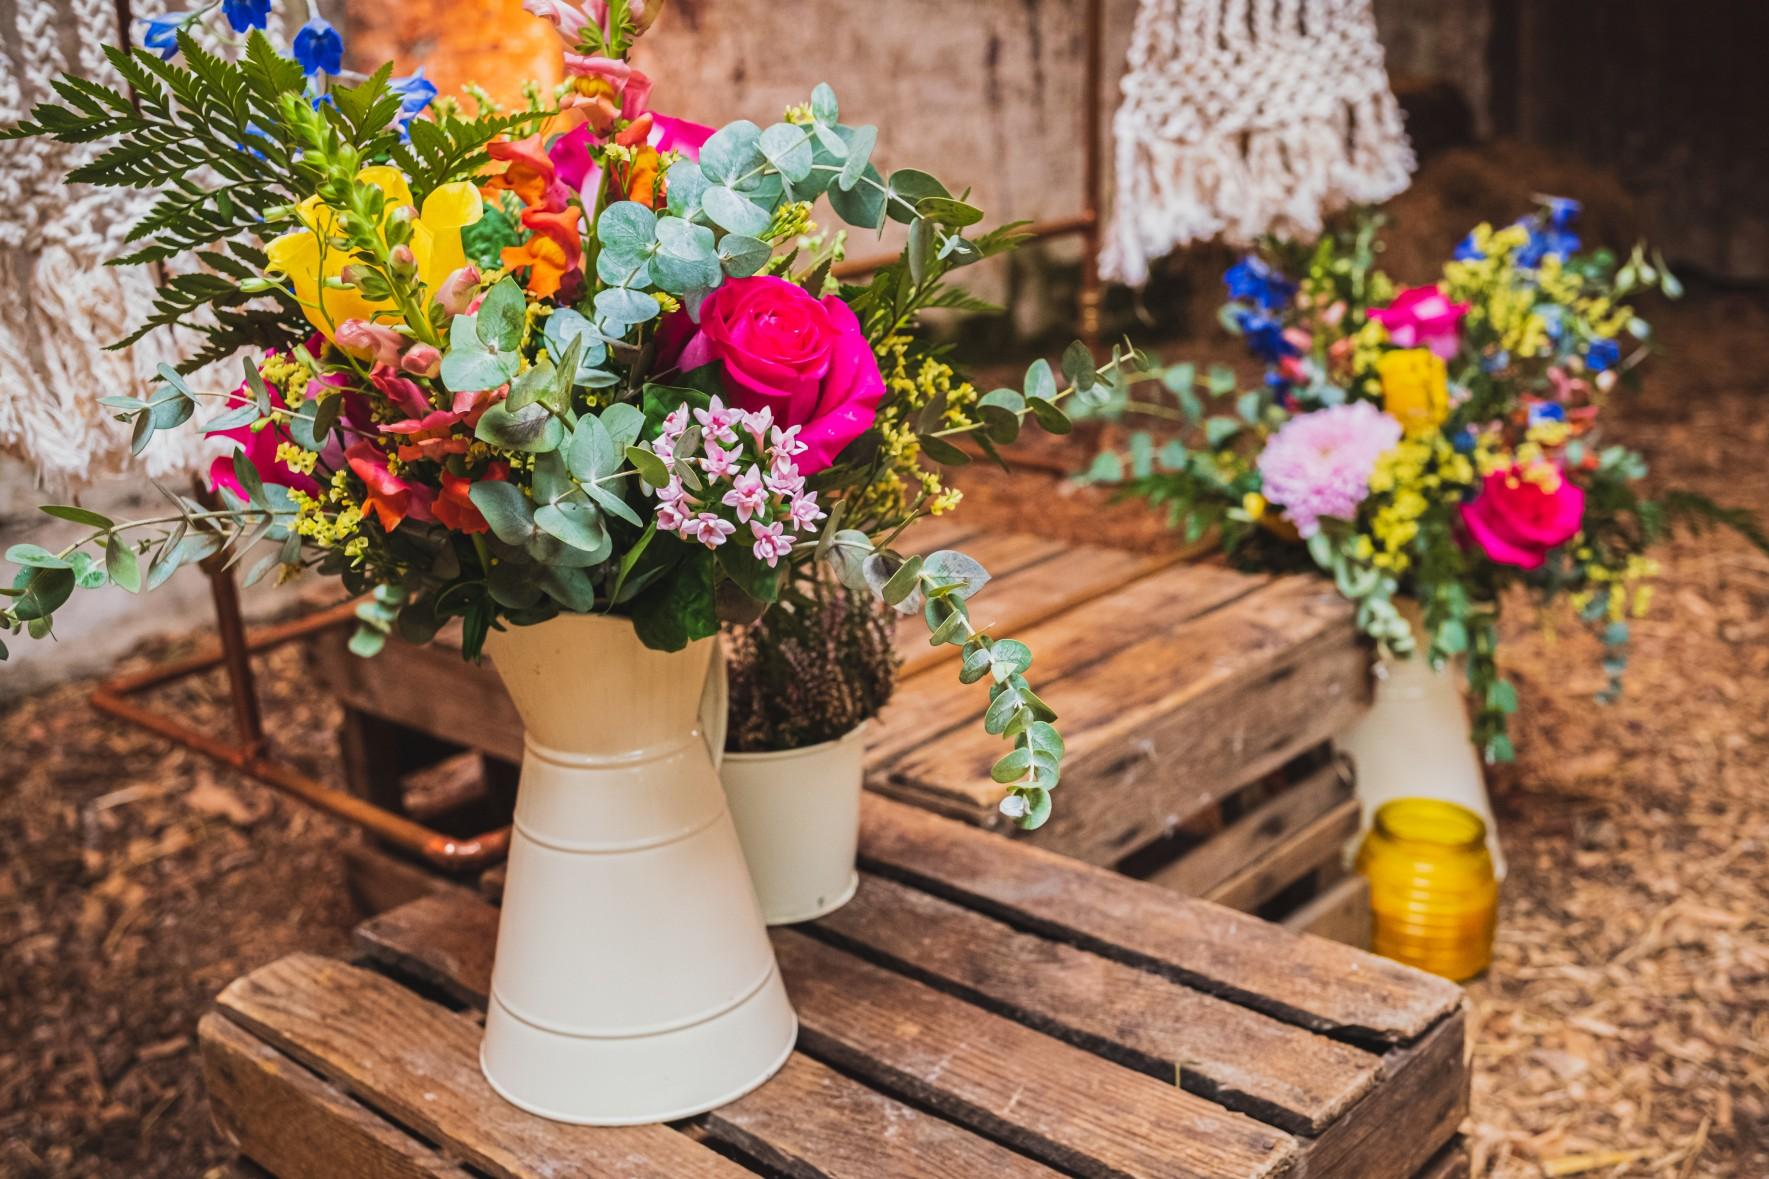 unique wedding flowers - boho wedding flowers - colourful wedding flowers - bright wedding flowers - unconventional wedding